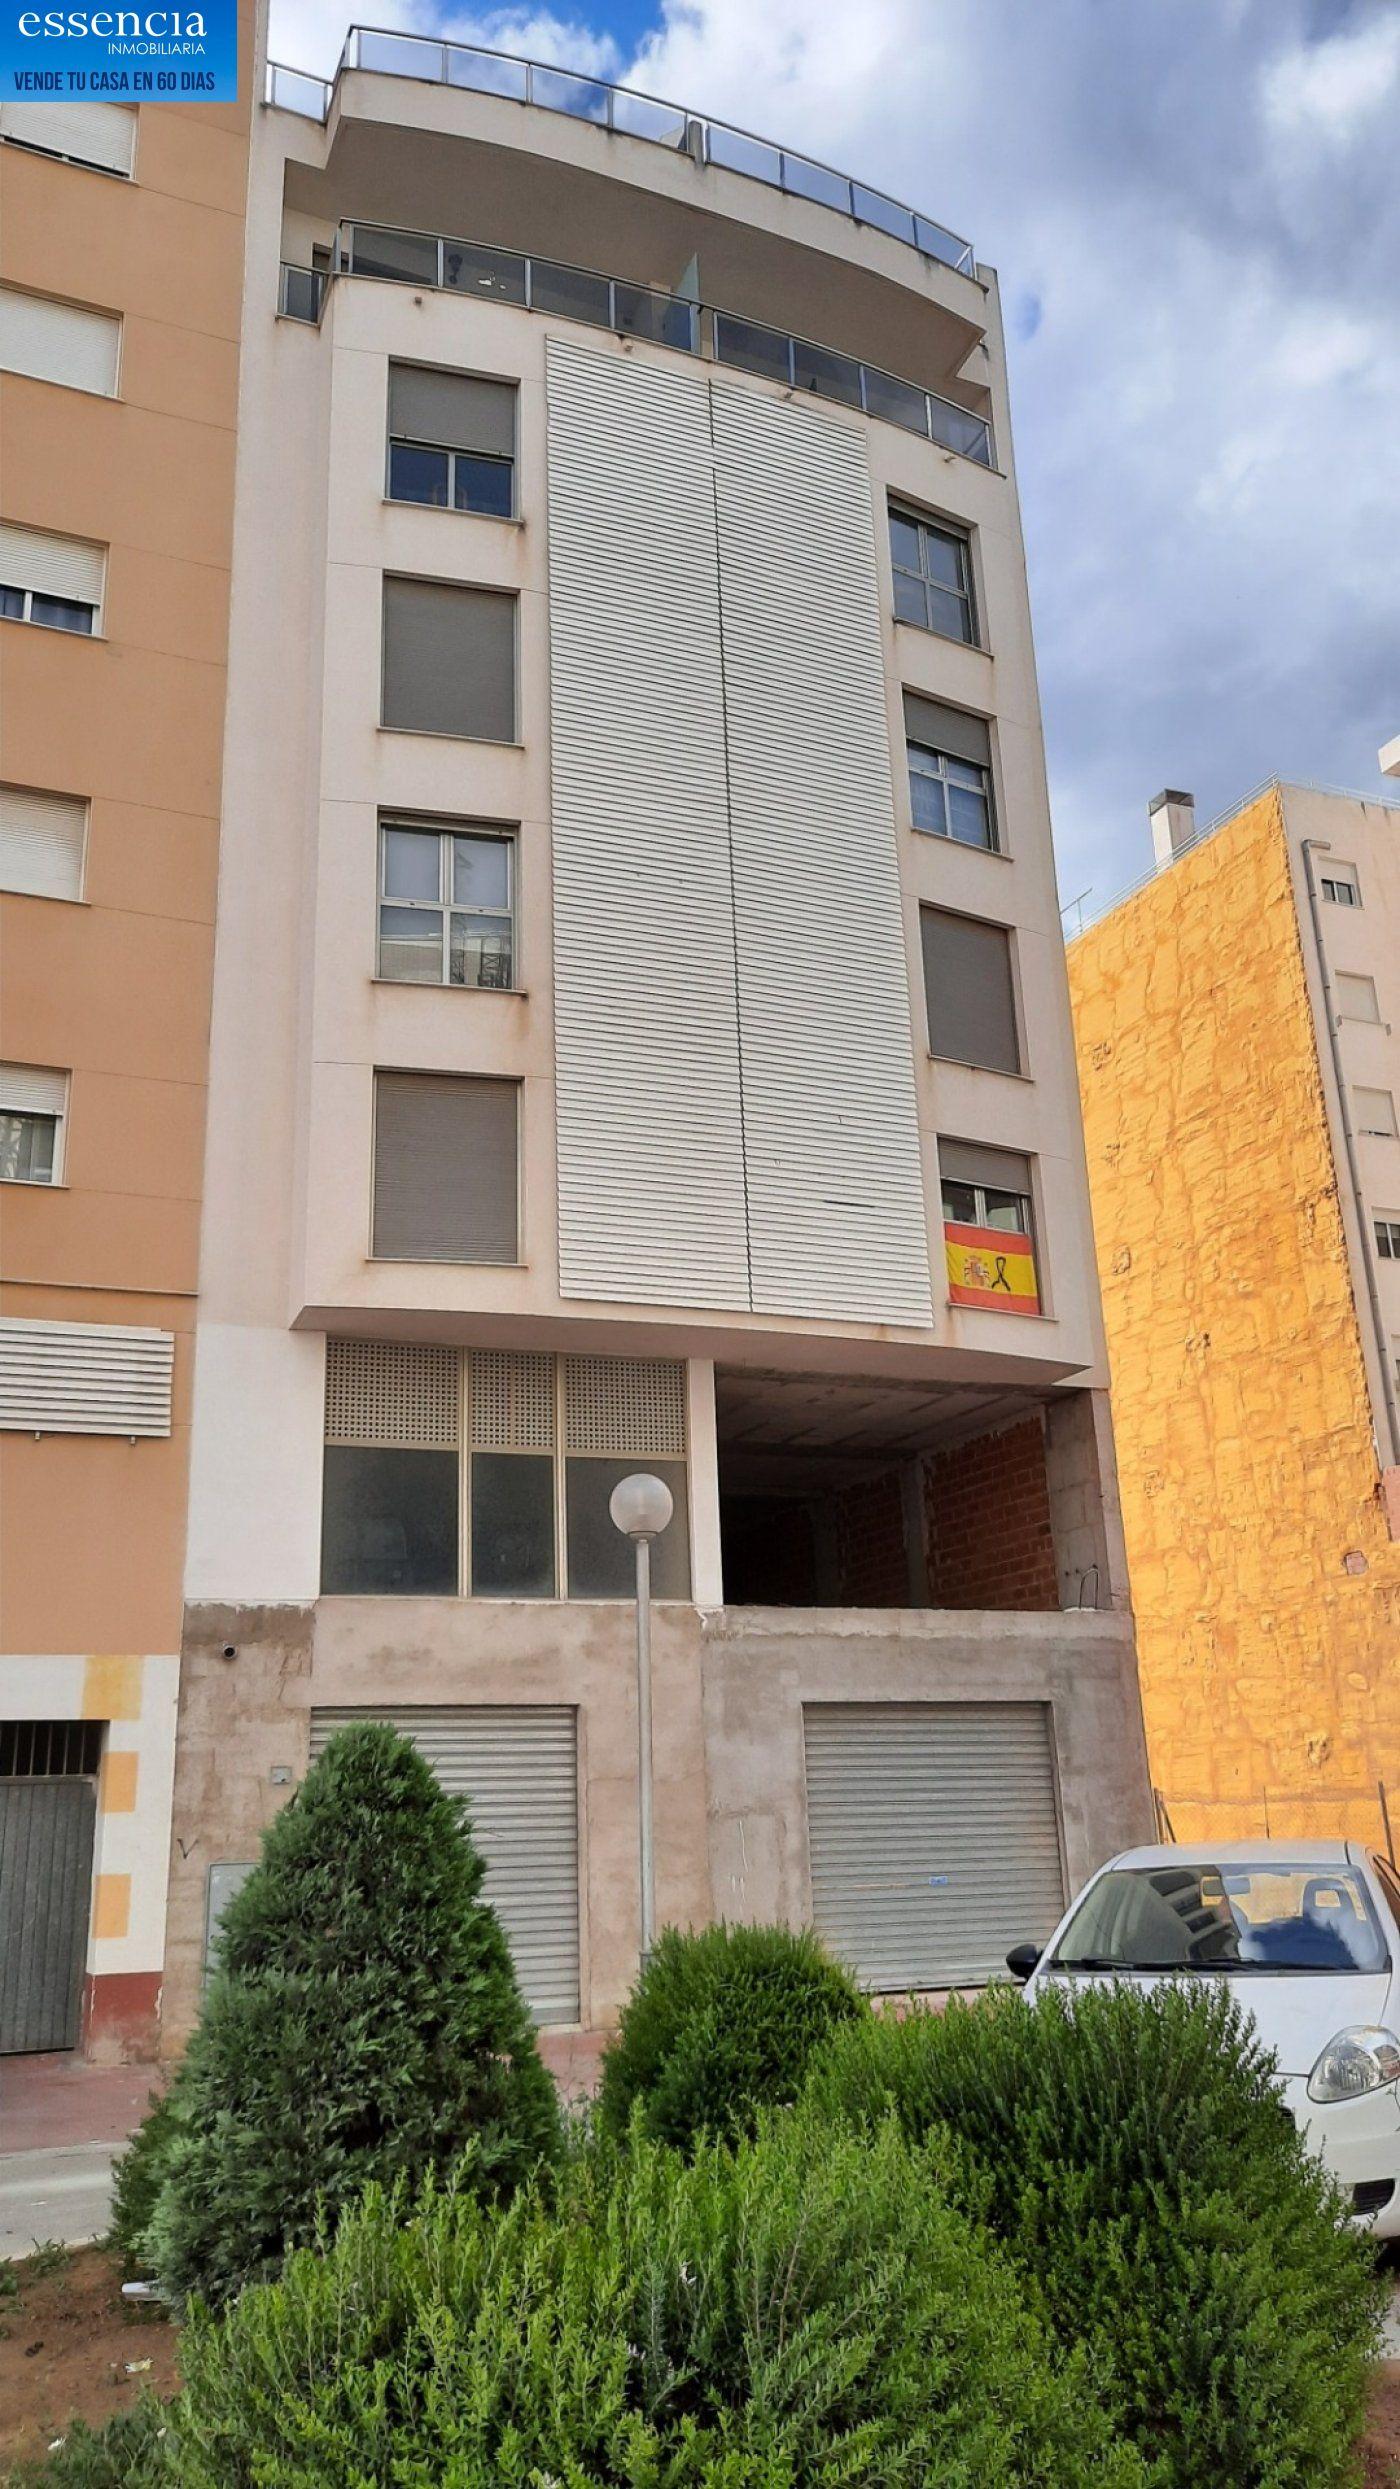 Oferta sin visitar. piso en oliva con ascensor, calle isaac albeniz - imagenInmueble9